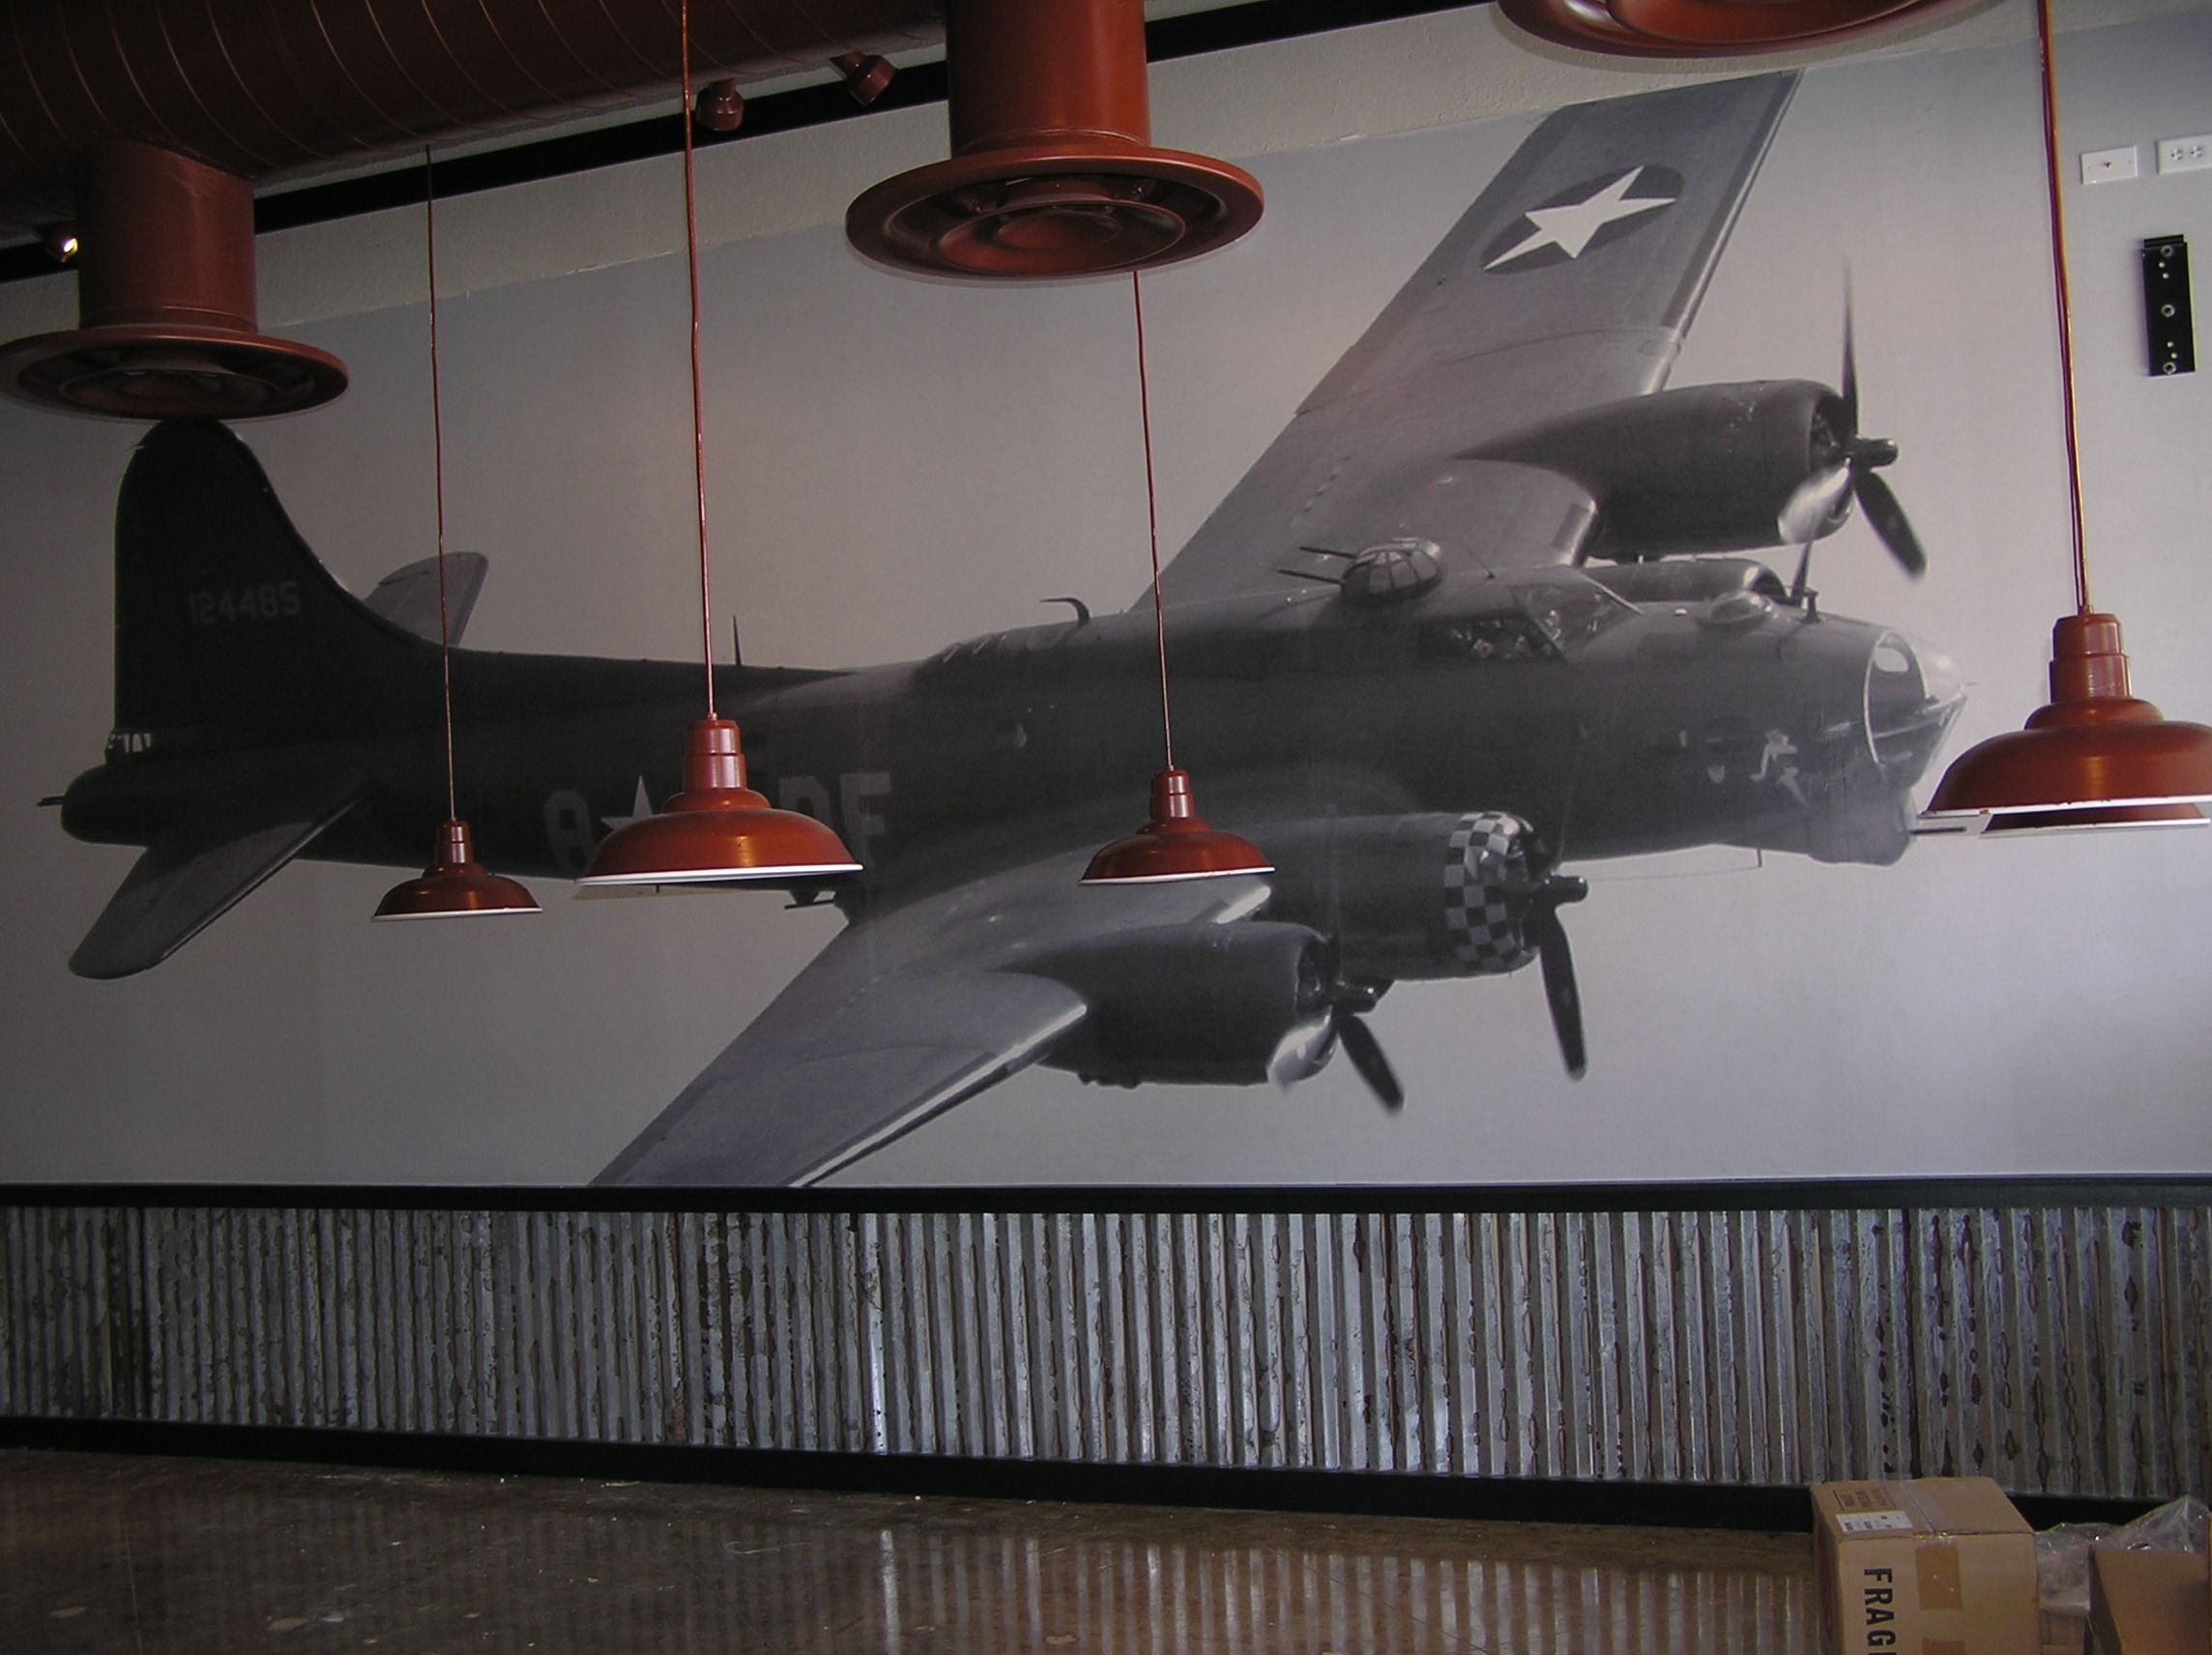 WingStop in Seguin TXfun mural to install Wall wallpaper 2288x1712